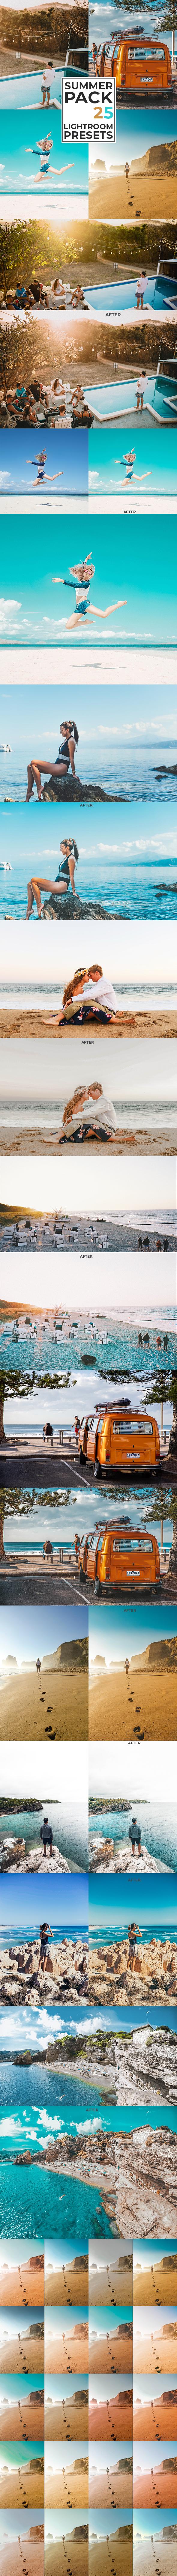 Beach Lightroom Presets - Lightroom Presets Add-ons